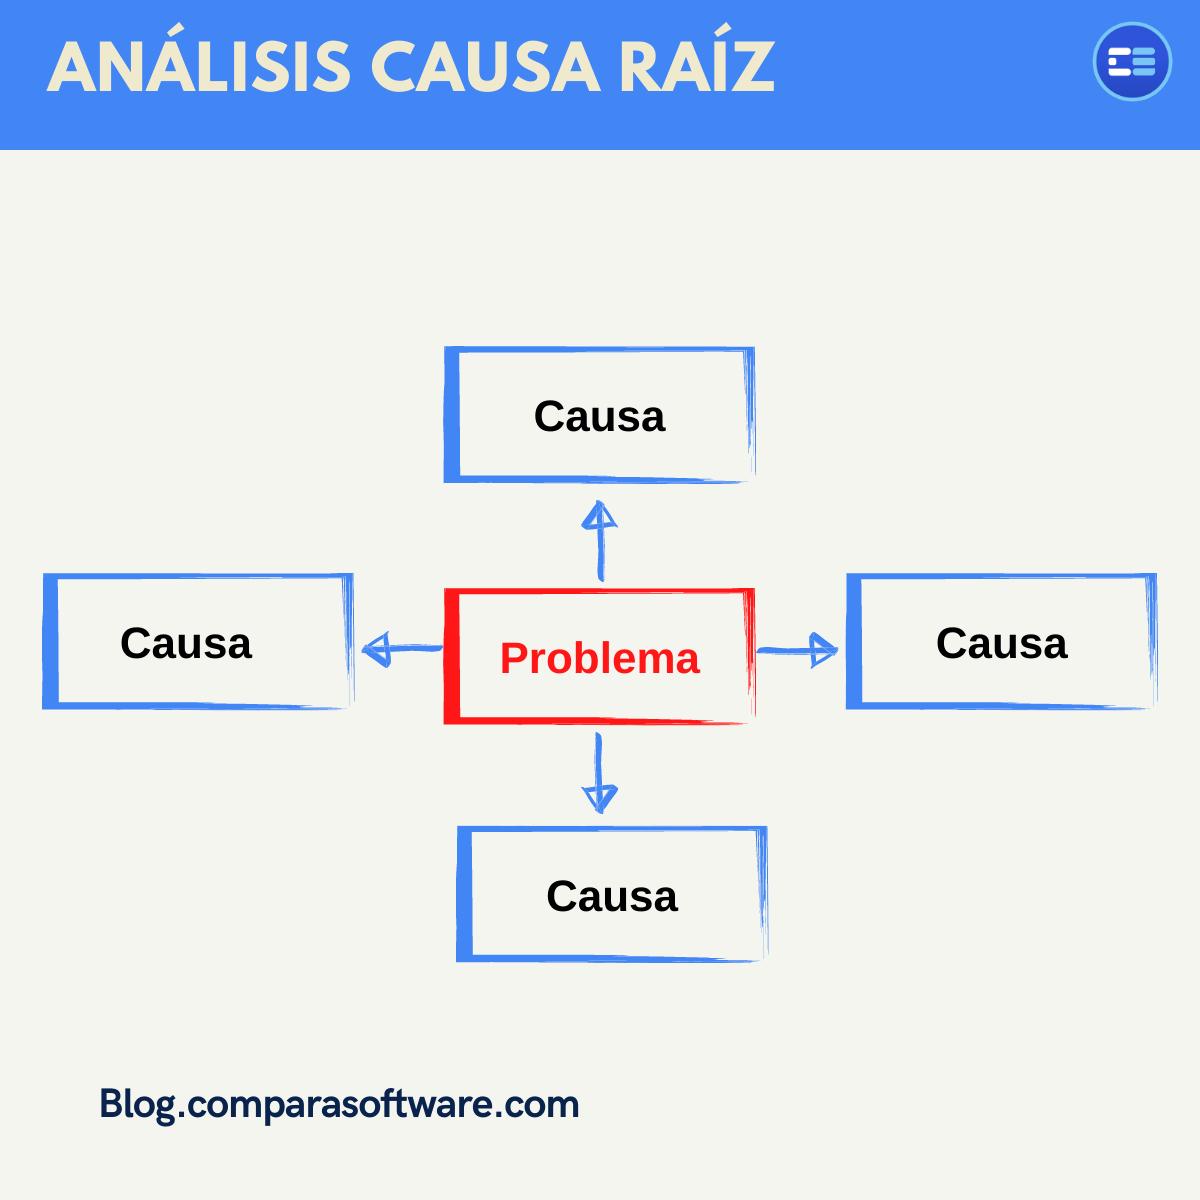 análisis causa raiz